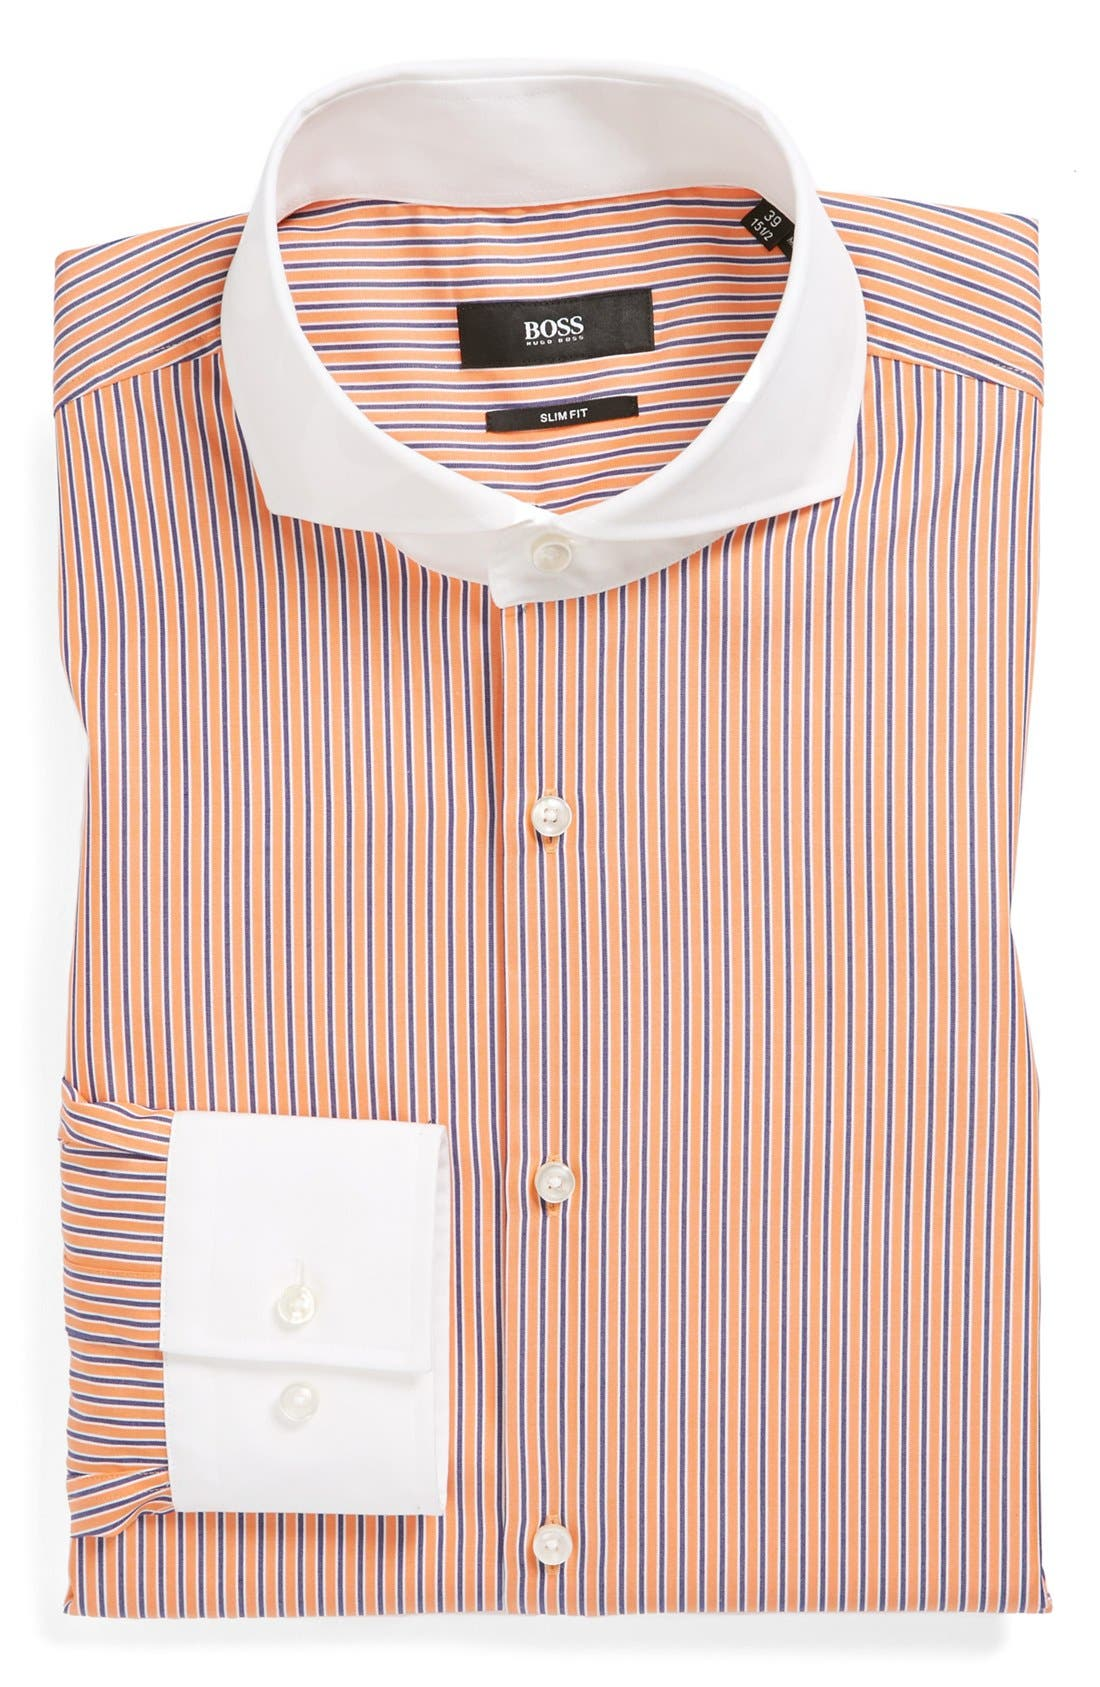 Alternate Image 1 Selected - BOSS HUGO BOSS 'Johan' Slim Fit Non-Iron Dress Shirt